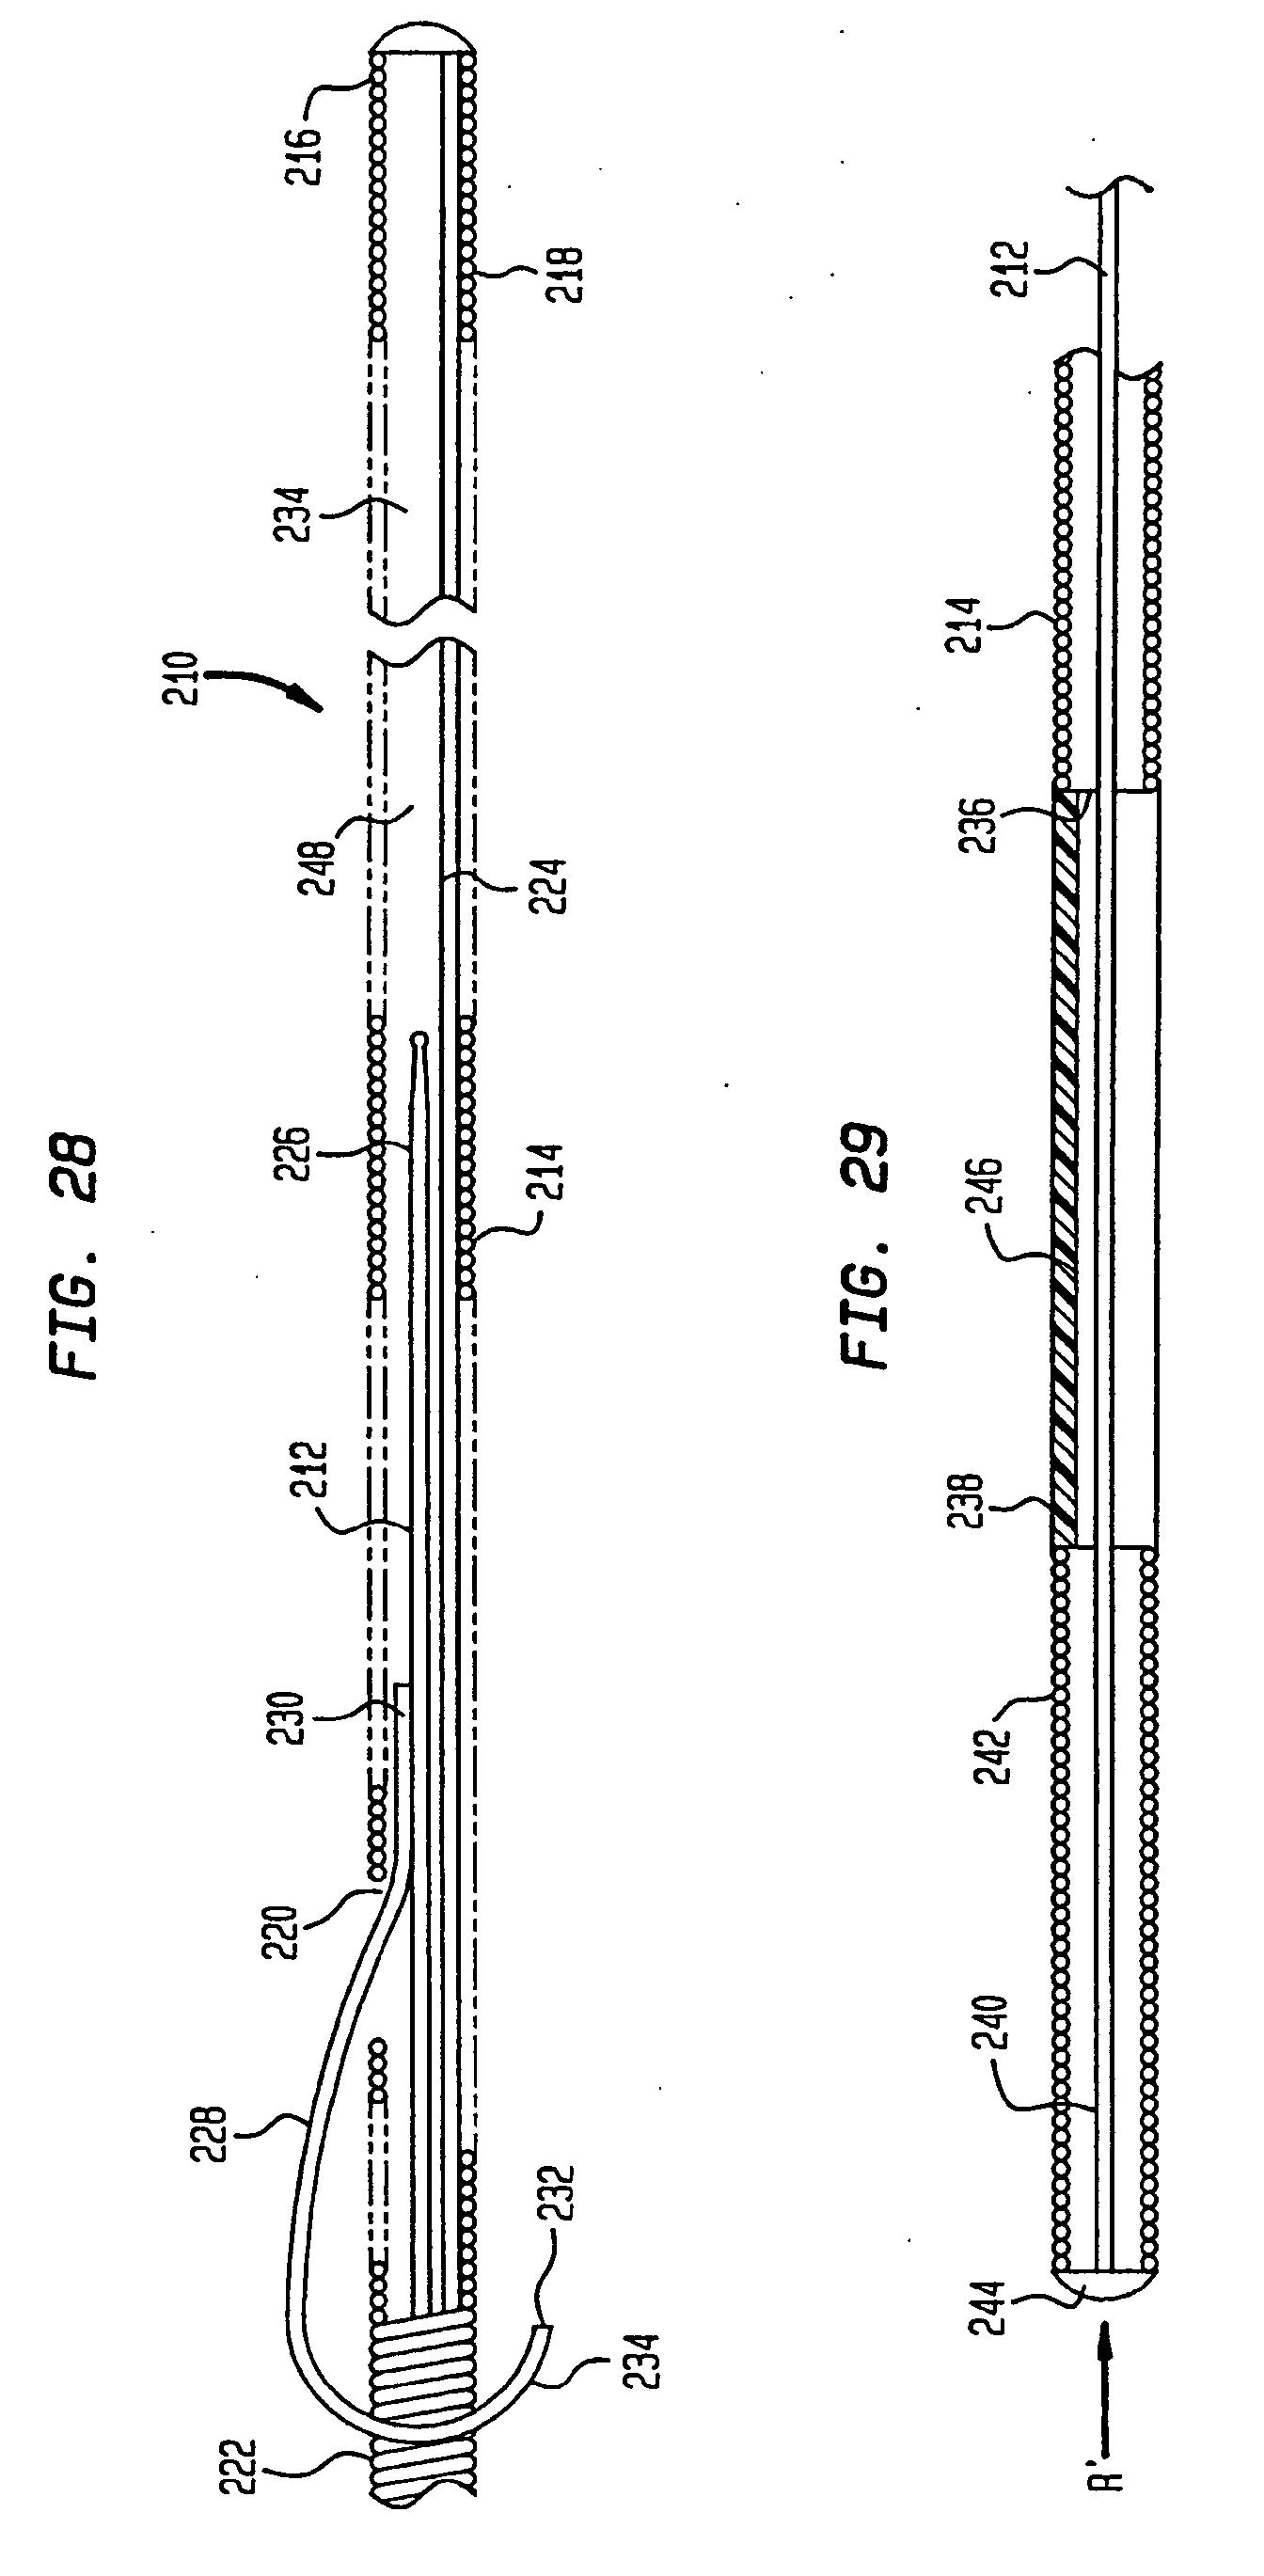 Patent ep1598016a2 f hrungsdraht mit l sbarem anker - Anker englisch ...